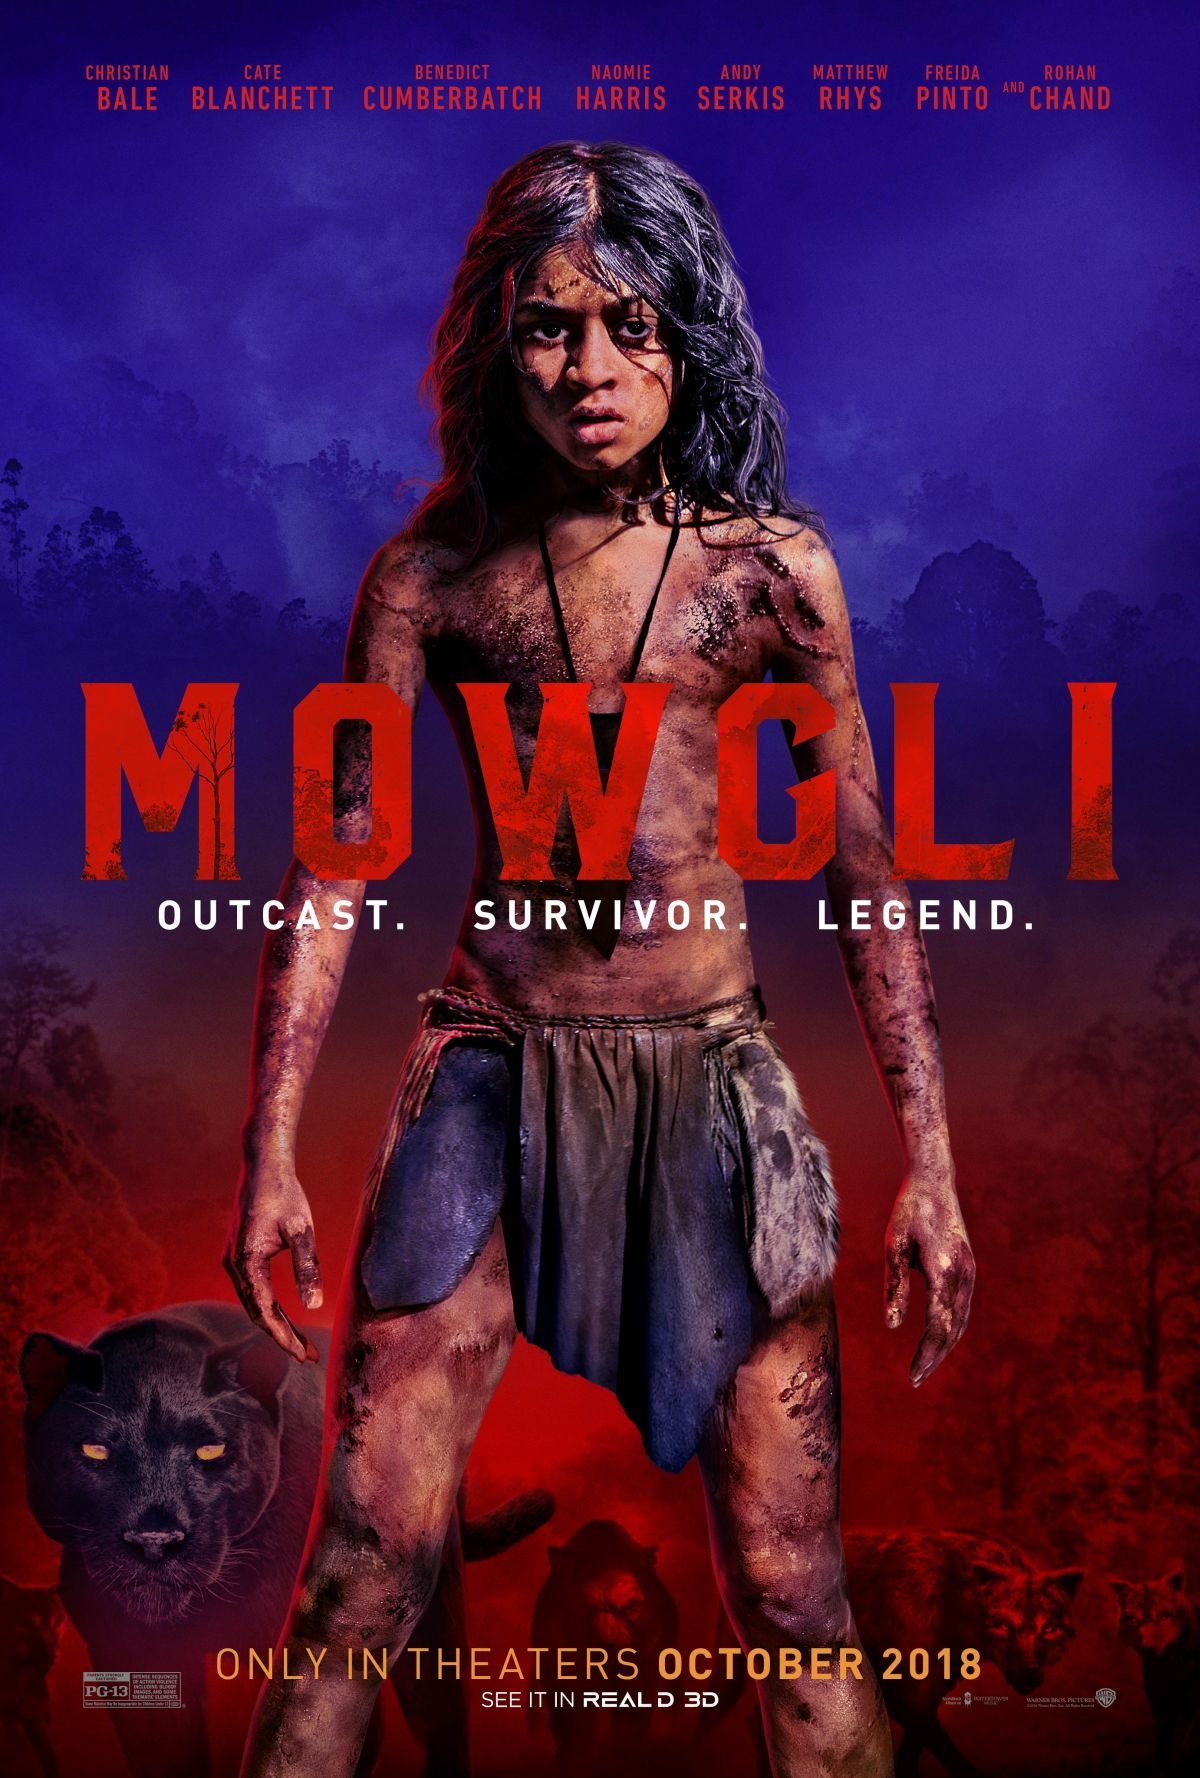 mowgli_vert_tsr_dom_2764x4096_master.jpg